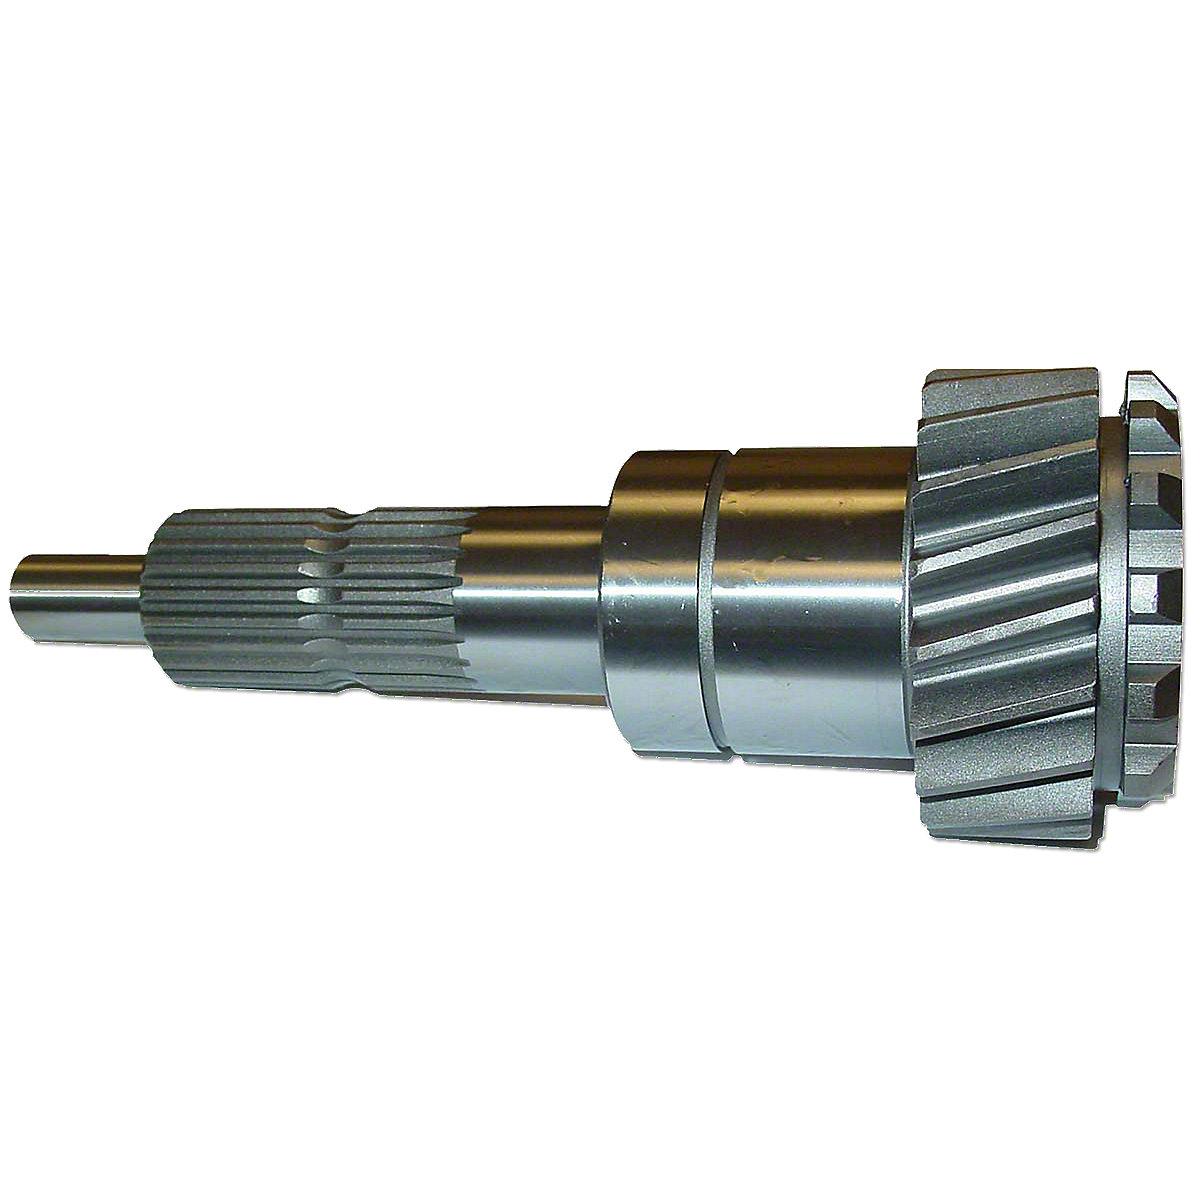 Transmission Input Shaft For Allis Chalmers: 190XT, 180, 0185, 190, 200.